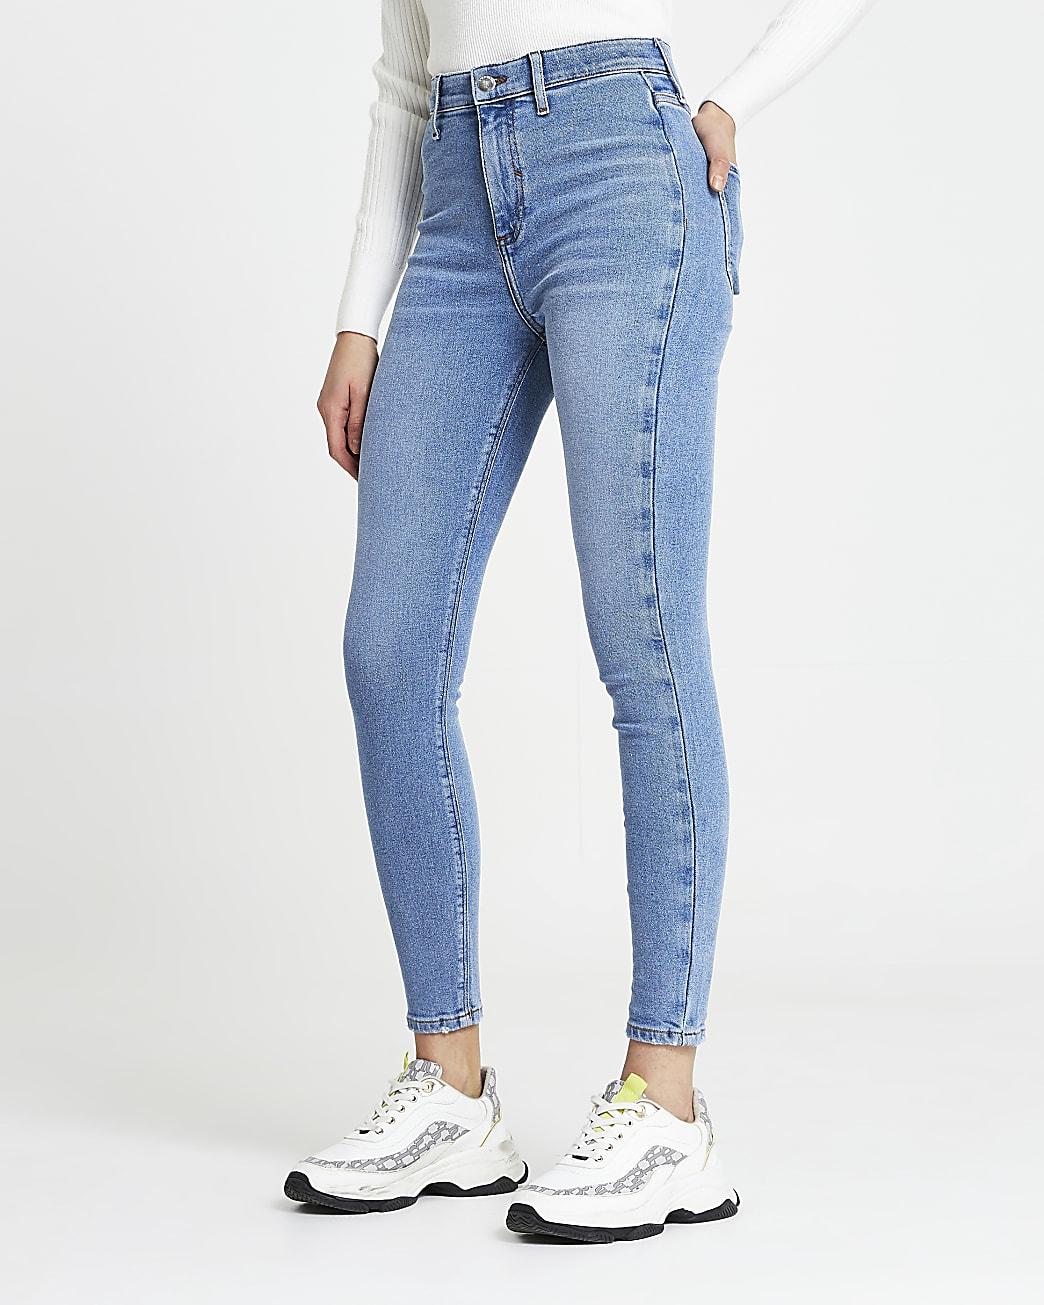 Blue Kaia high waisted jeans